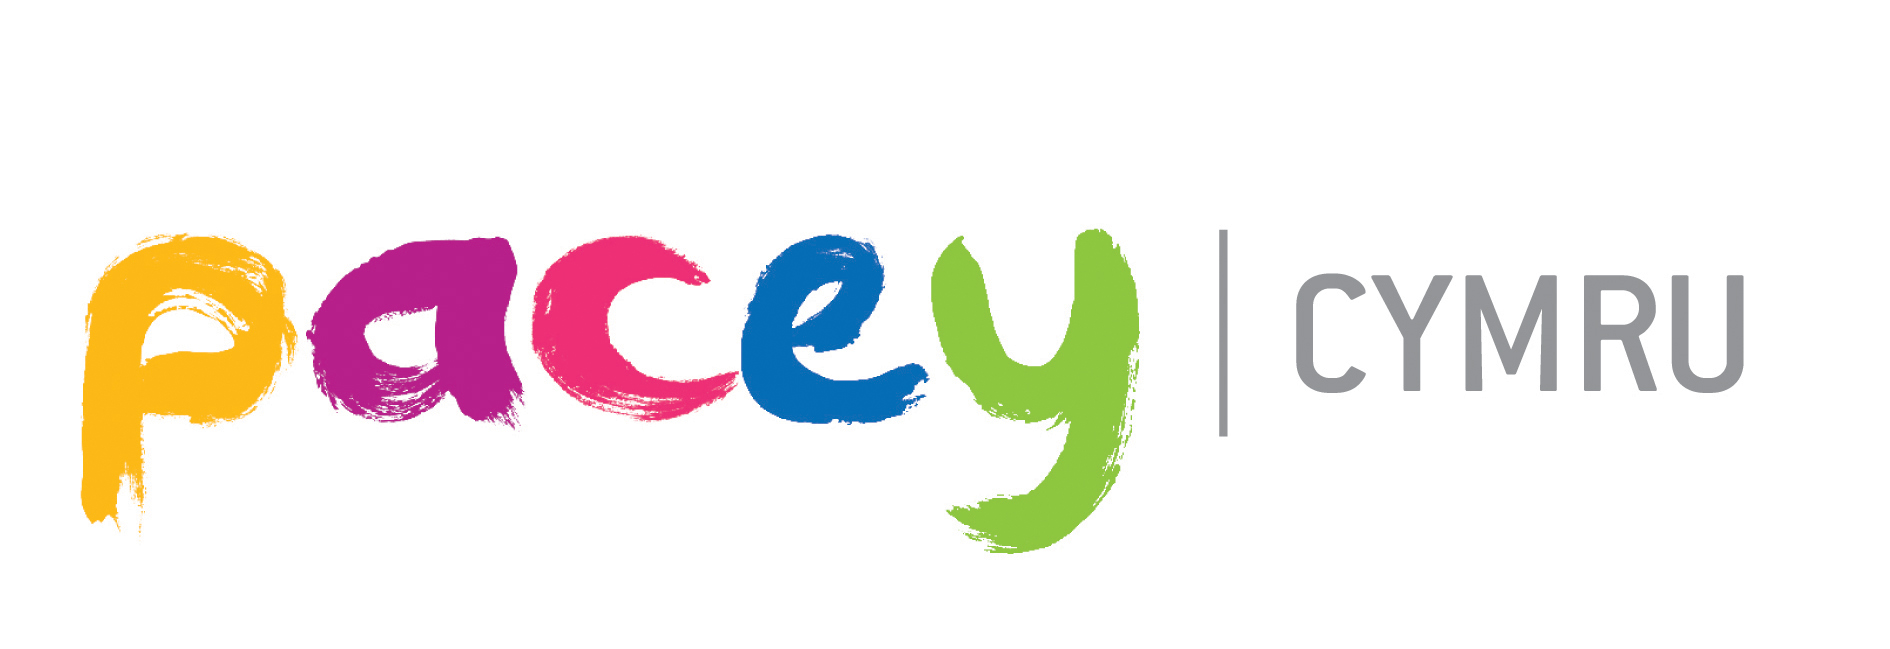 PACEY Cymru logo